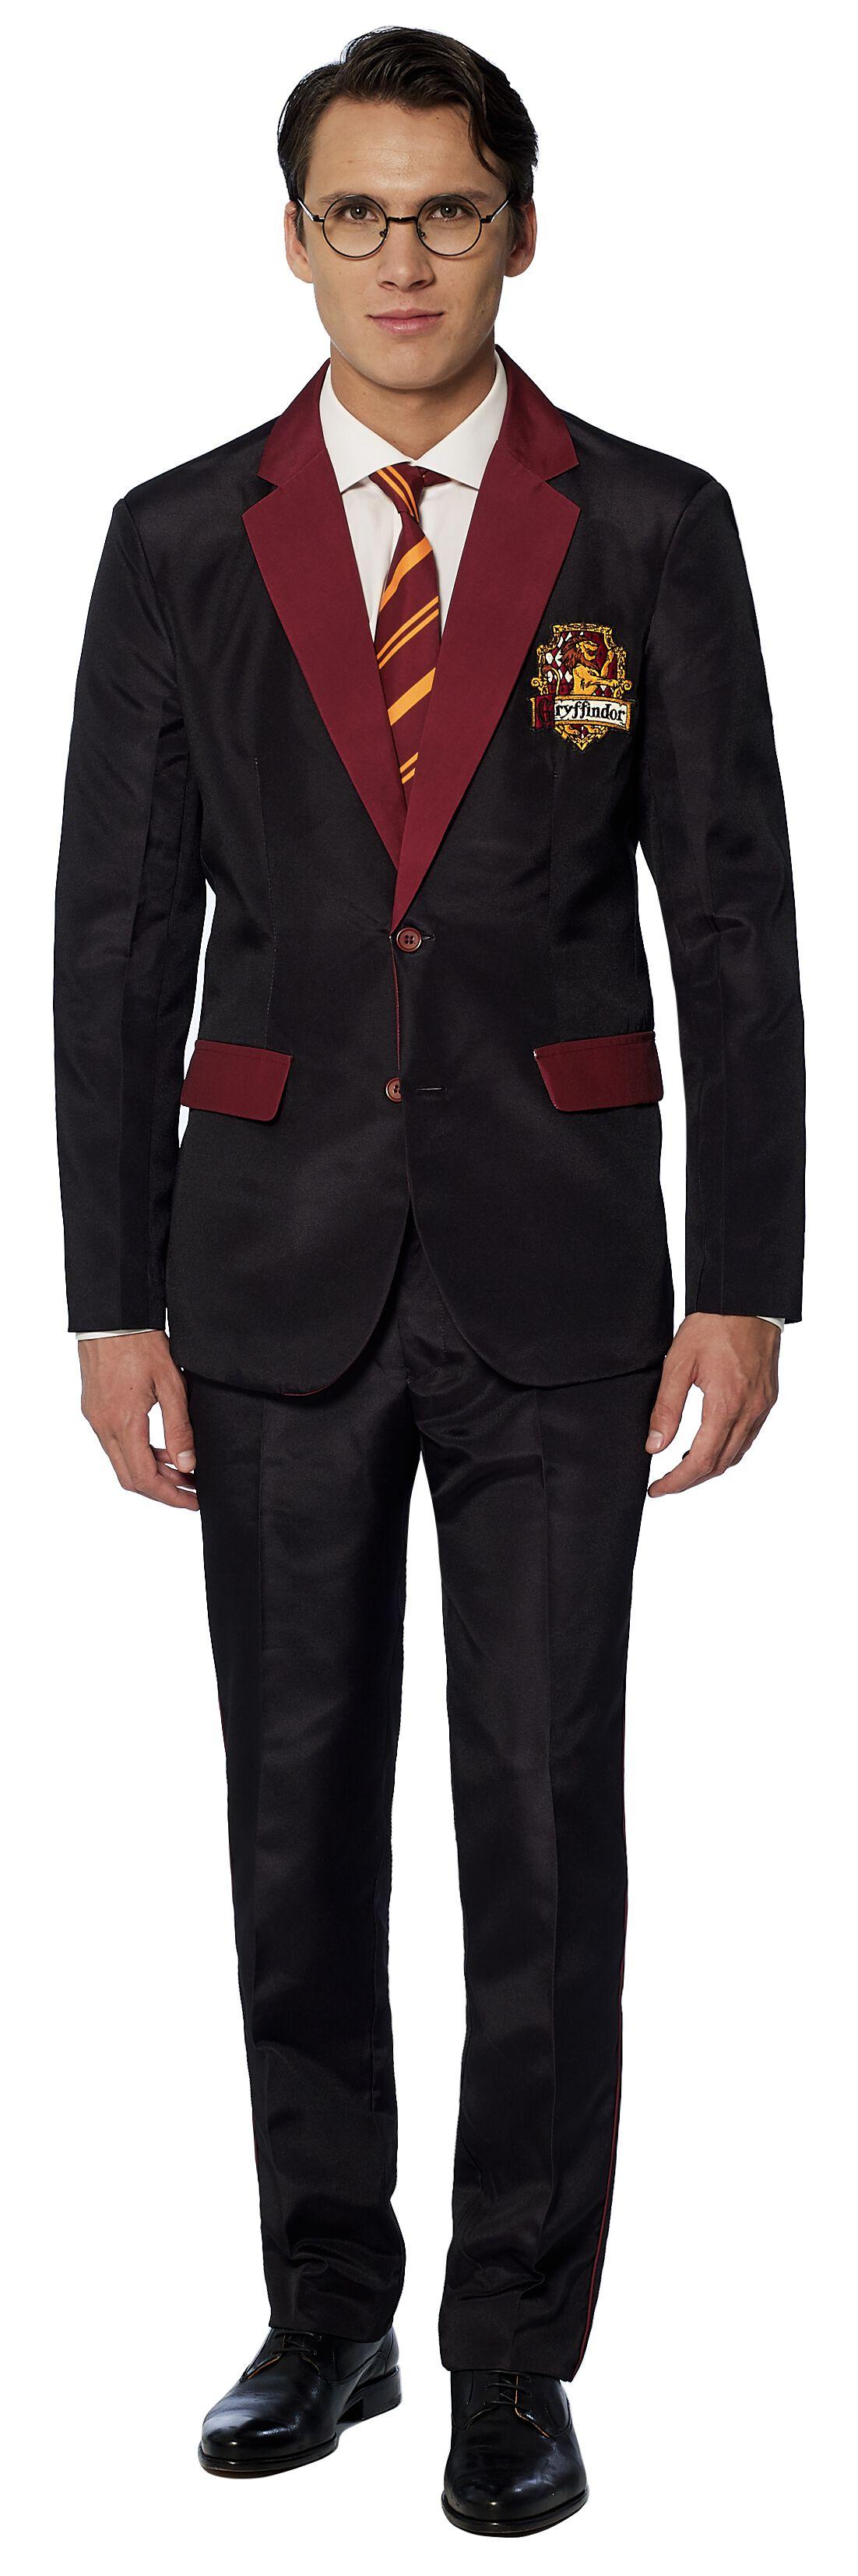 Image of   Harry Potter Oppsuits Kostume Standard